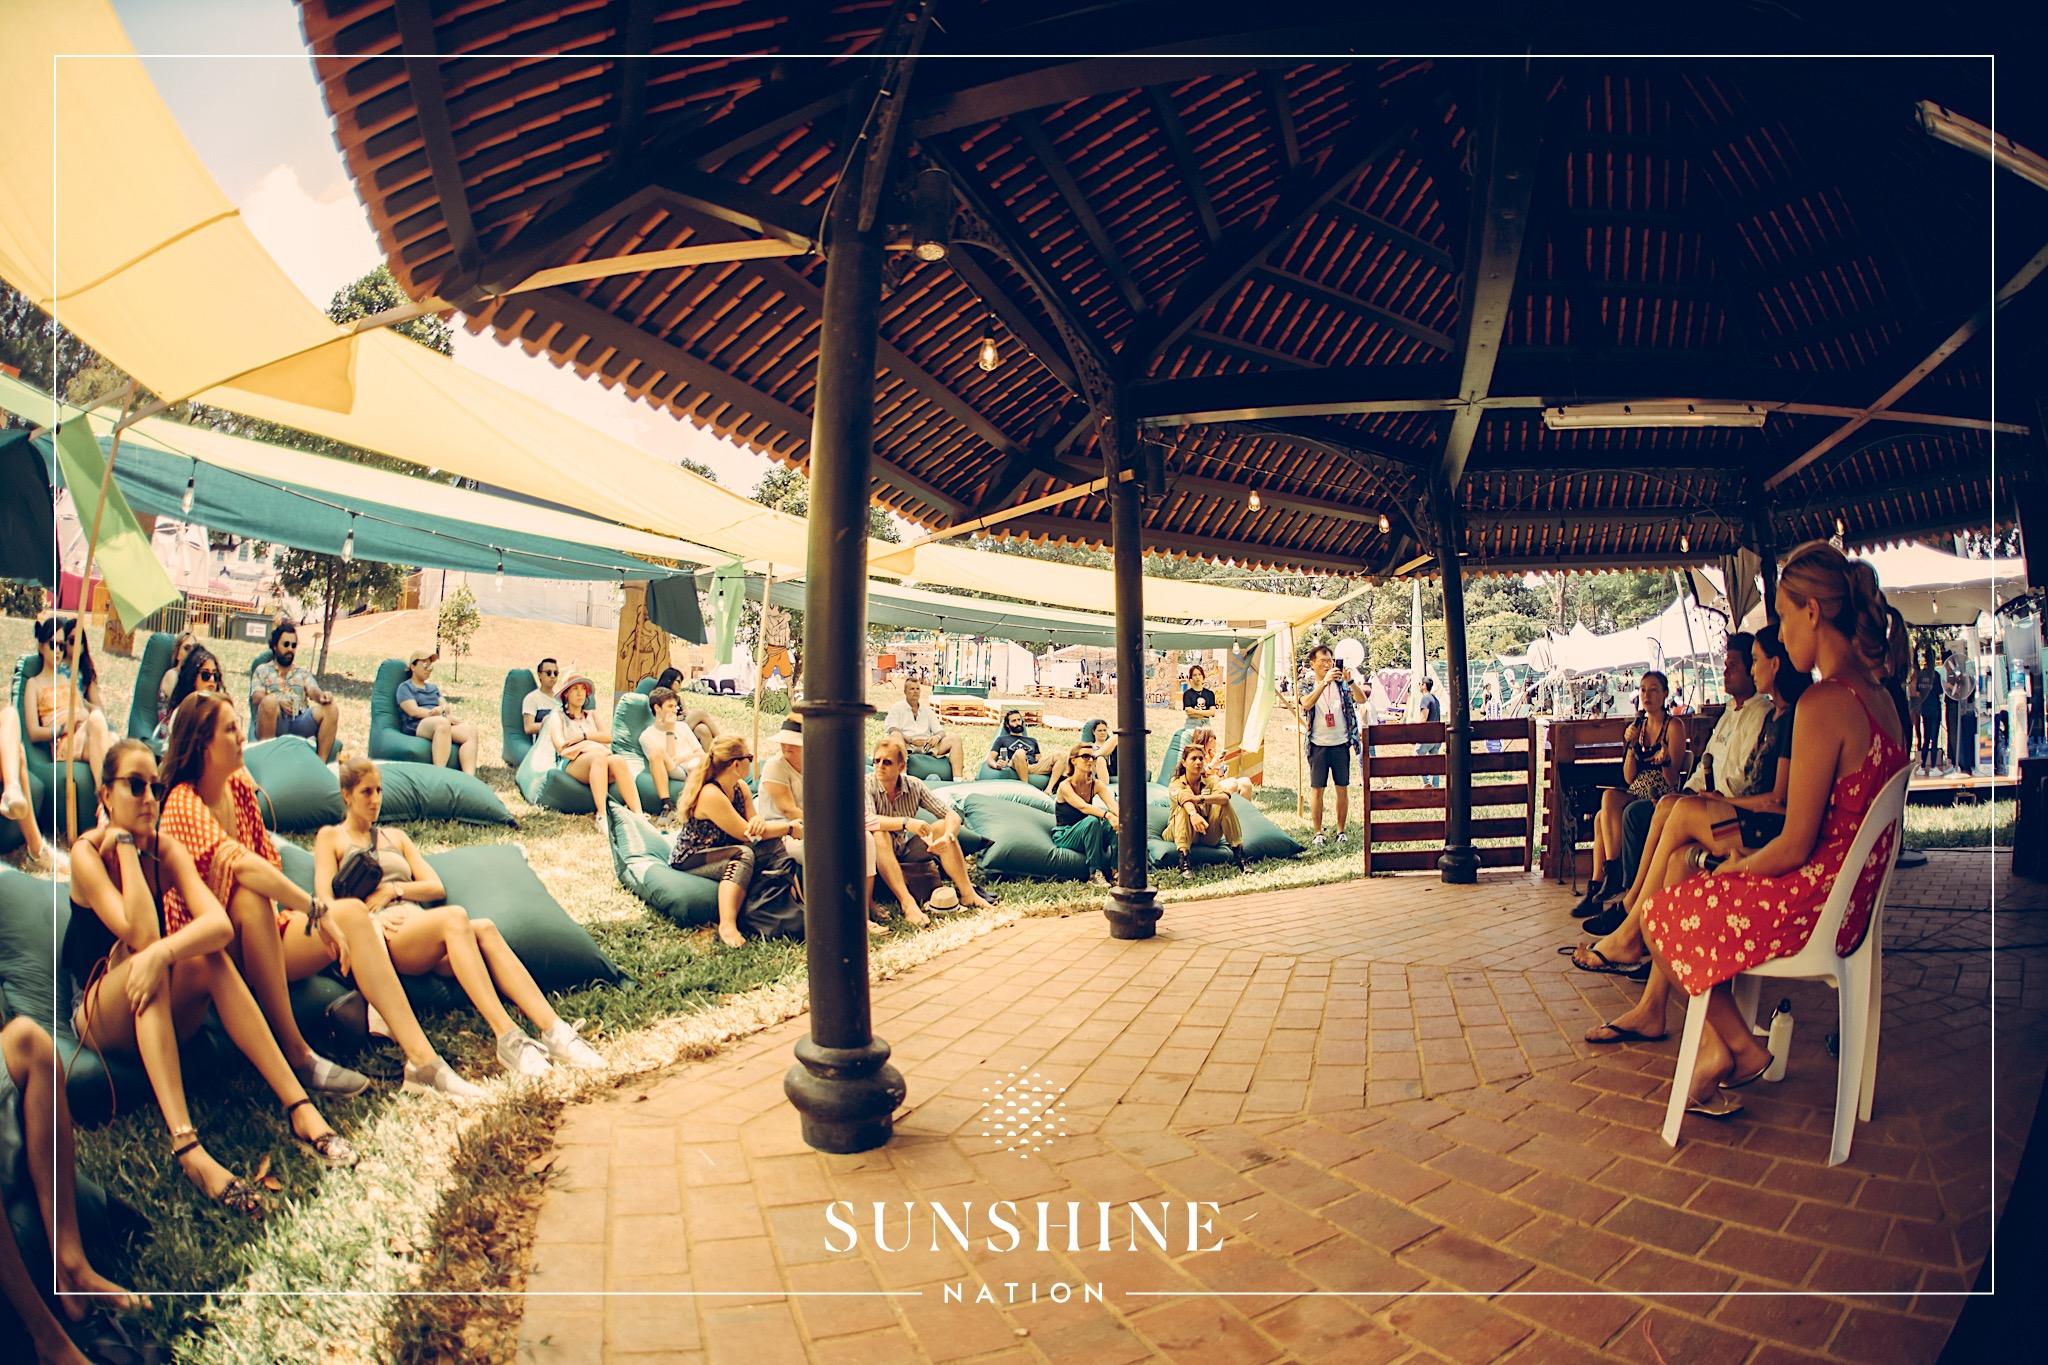 09032019_SunshineNation_Colossal035_Watermarked.jpg